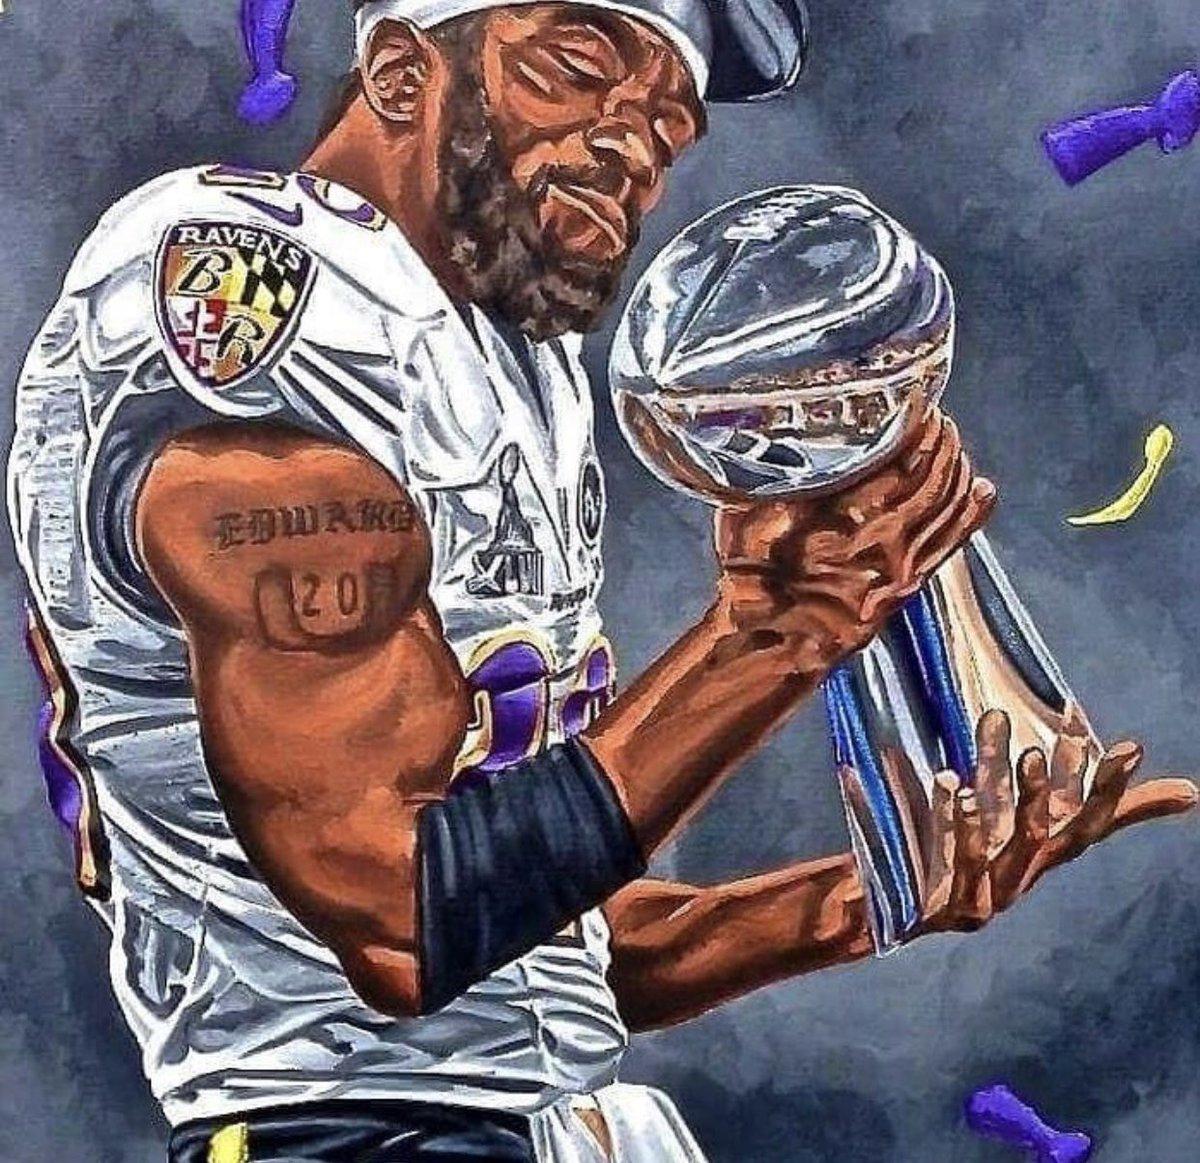 Amazing Fan Art  <br>http://pic.twitter.com/aztQ6pPUCM